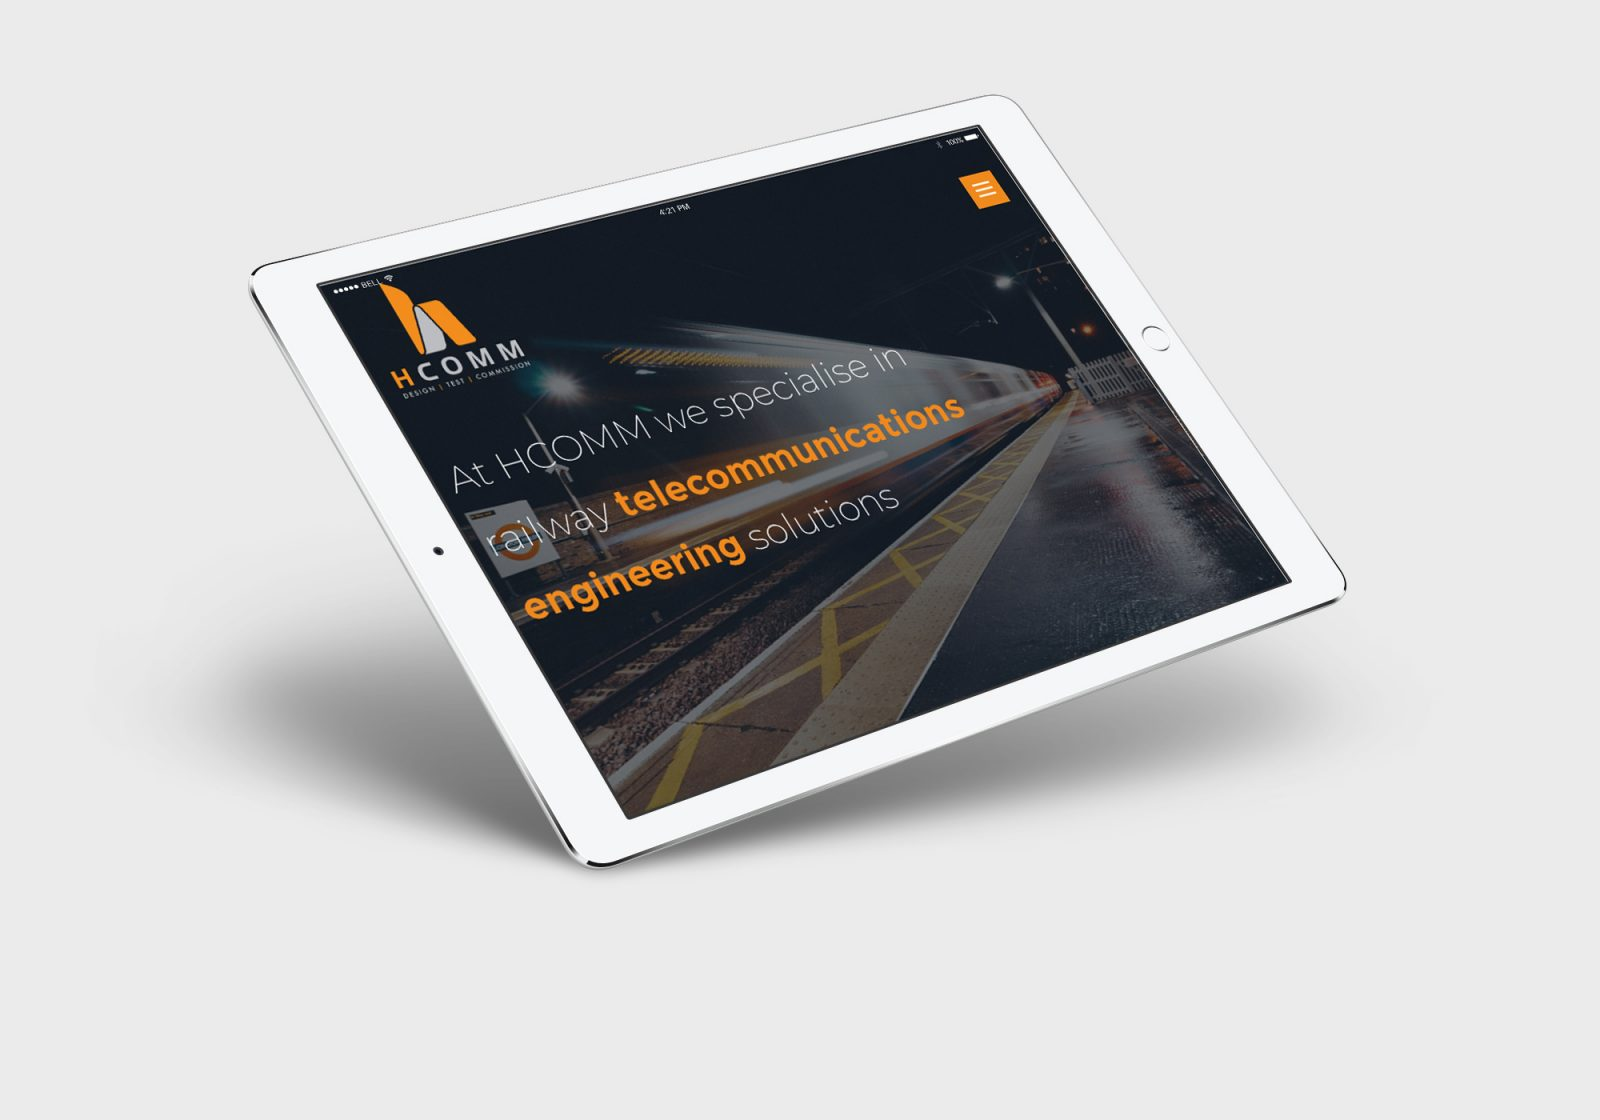 Hcomm's new website on a ipad